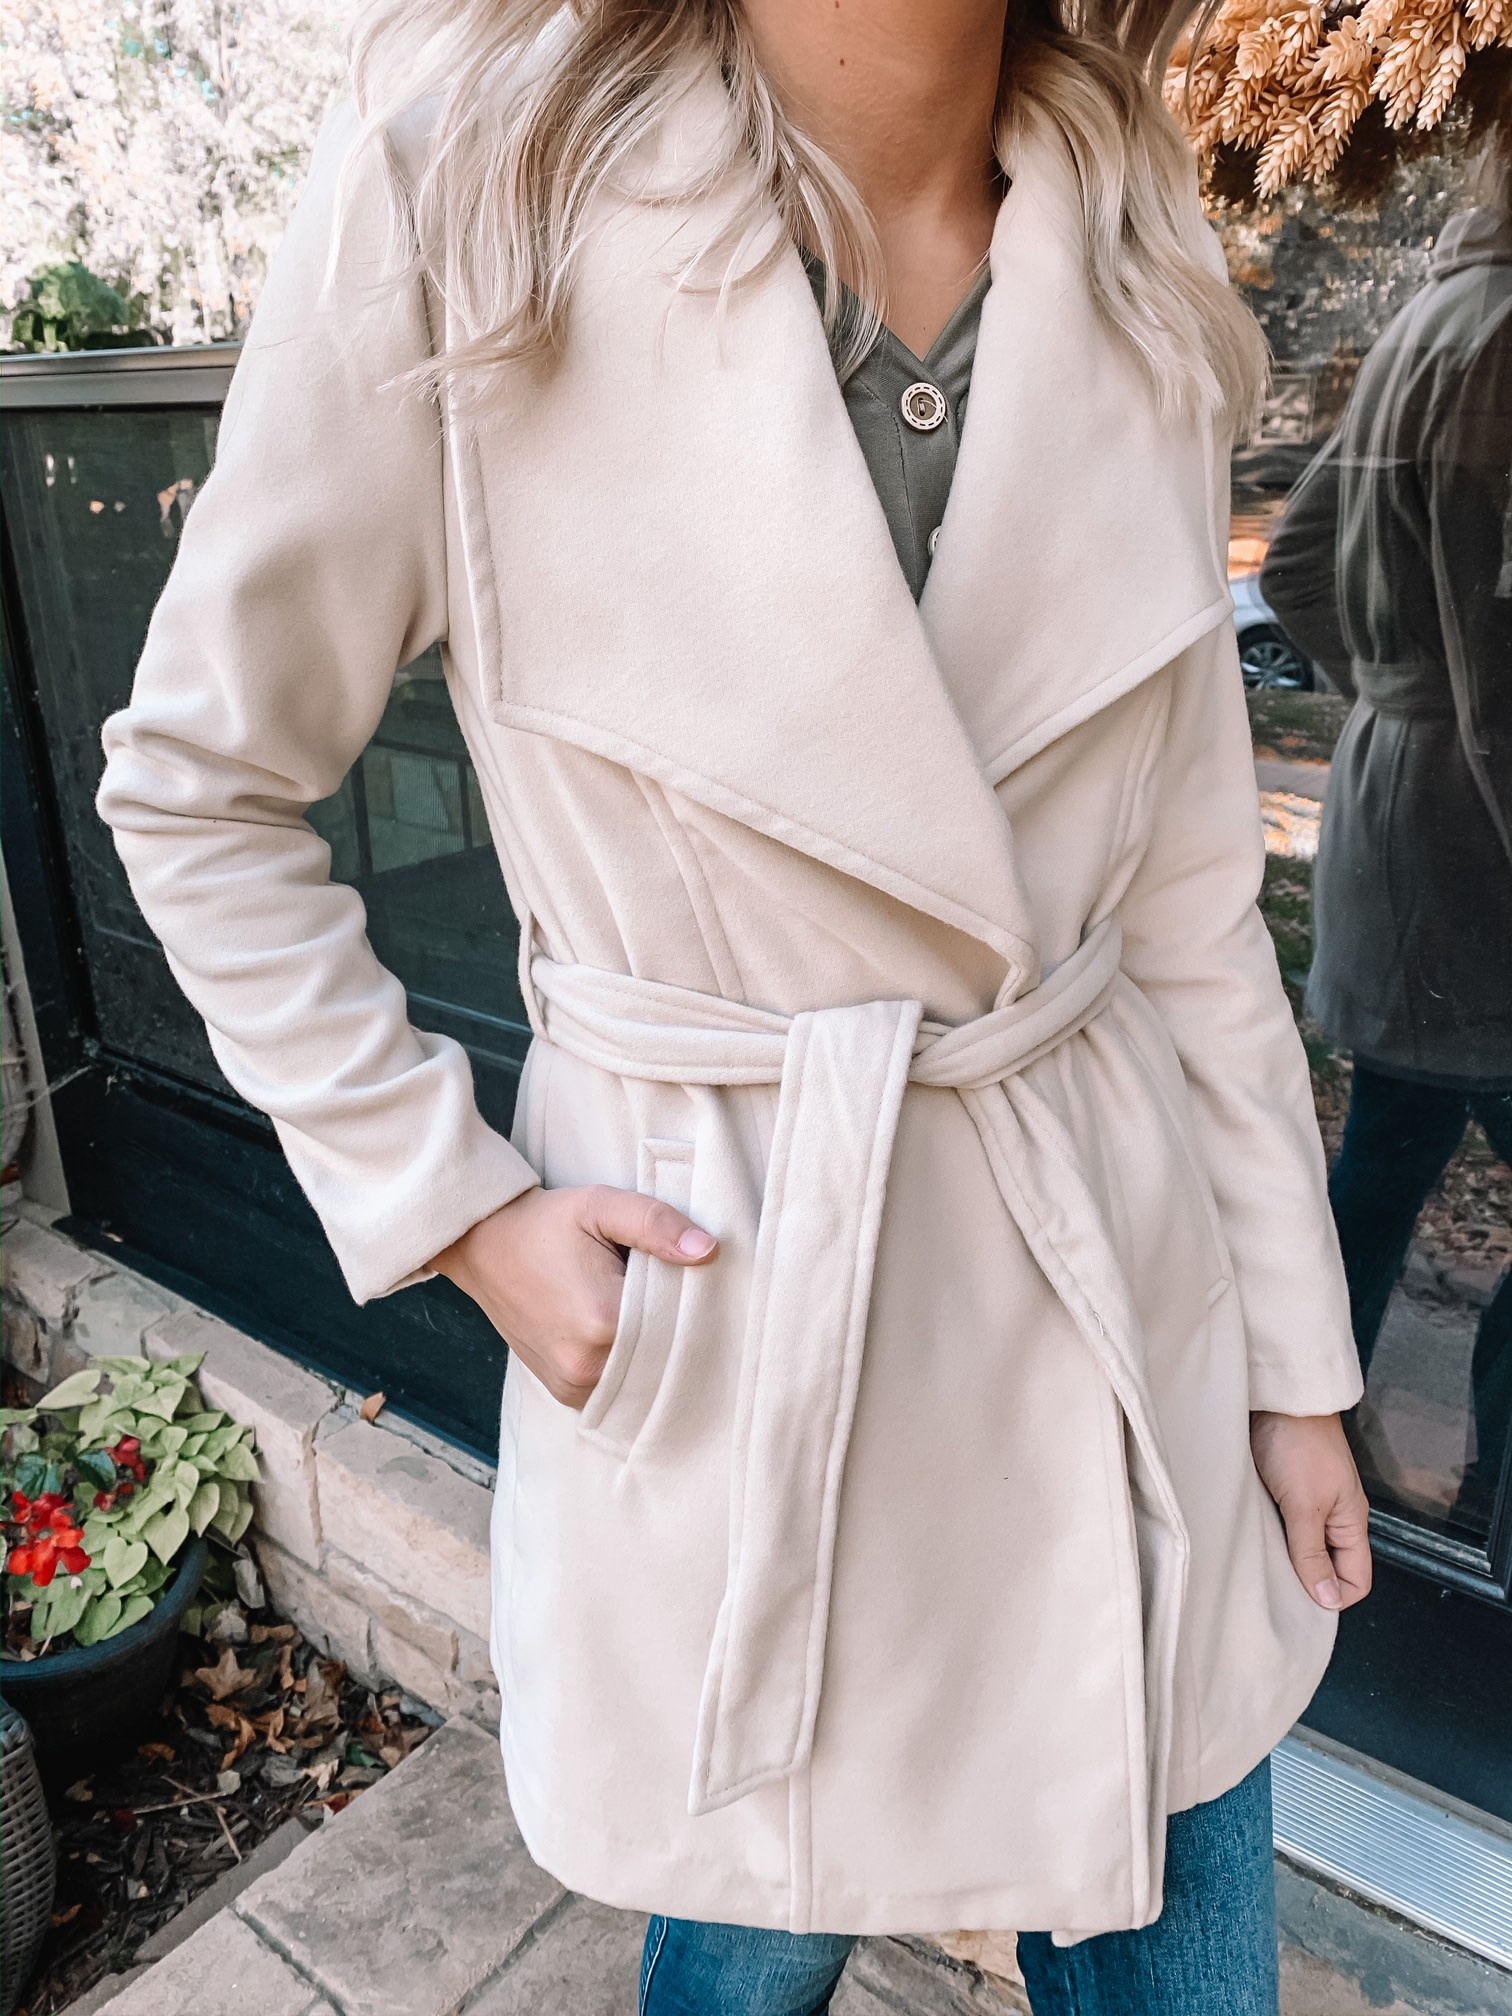 Emery Beige Belted Coat